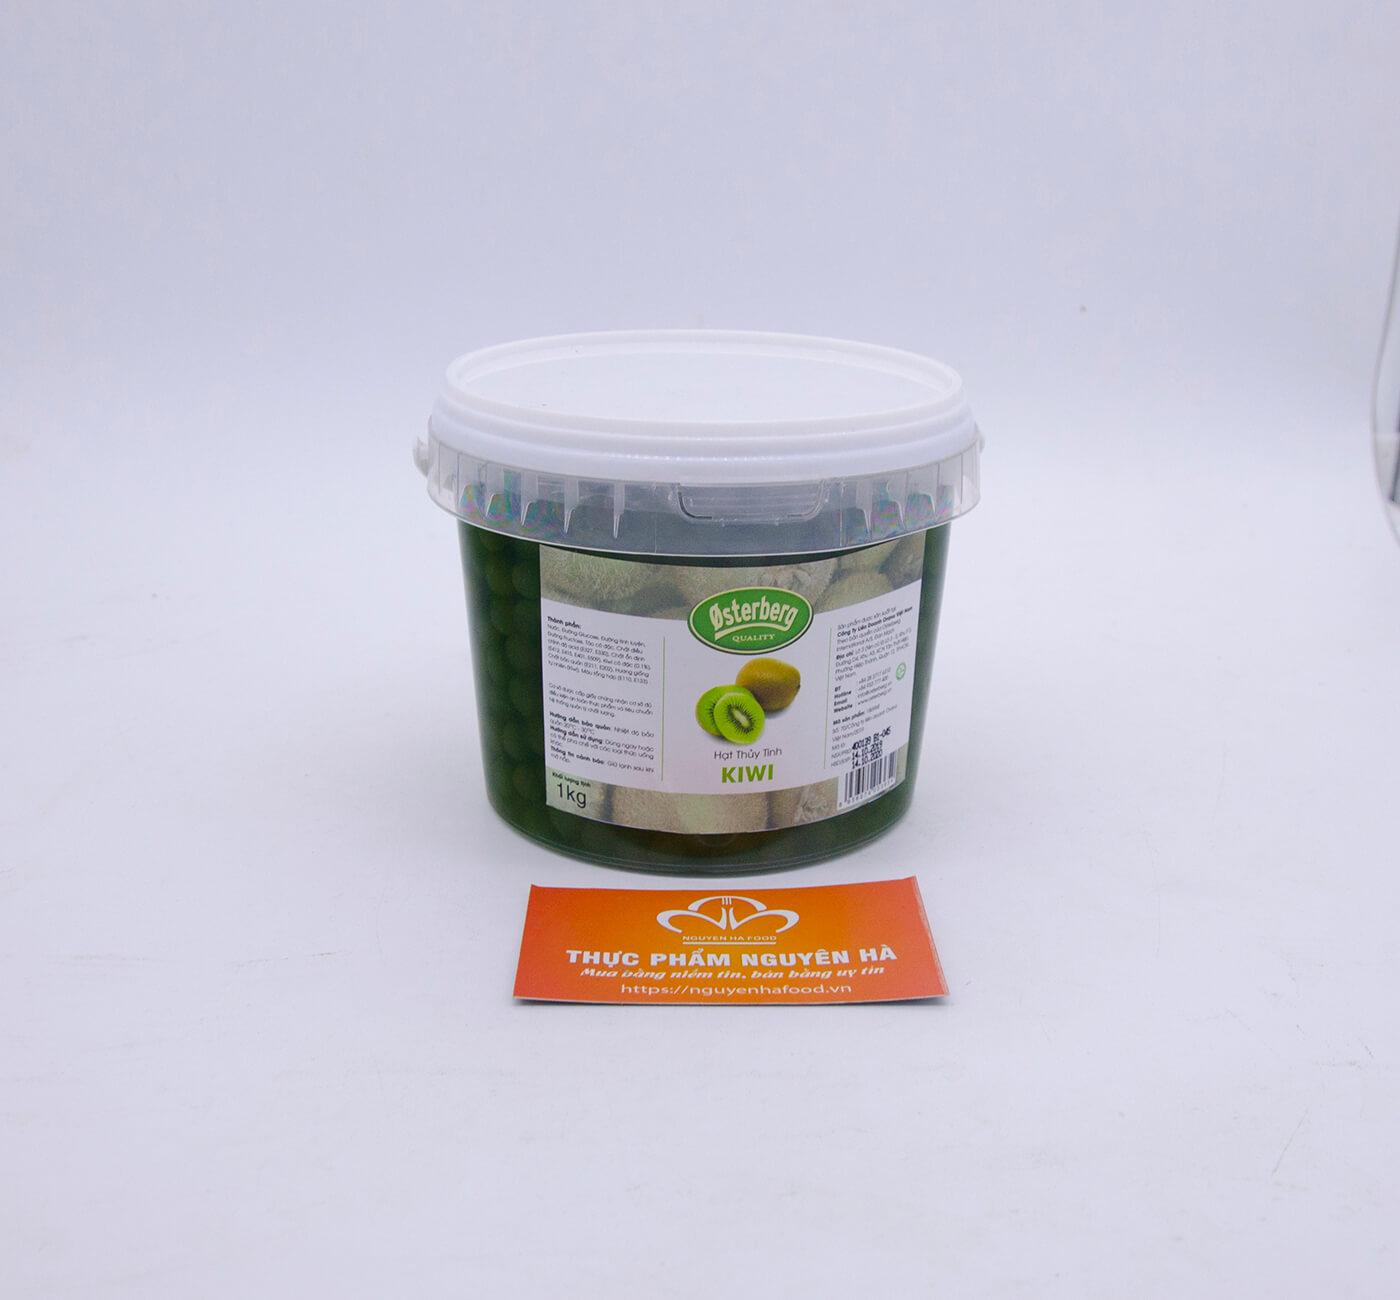 Hạt thủy tinh kiwi Osterberg